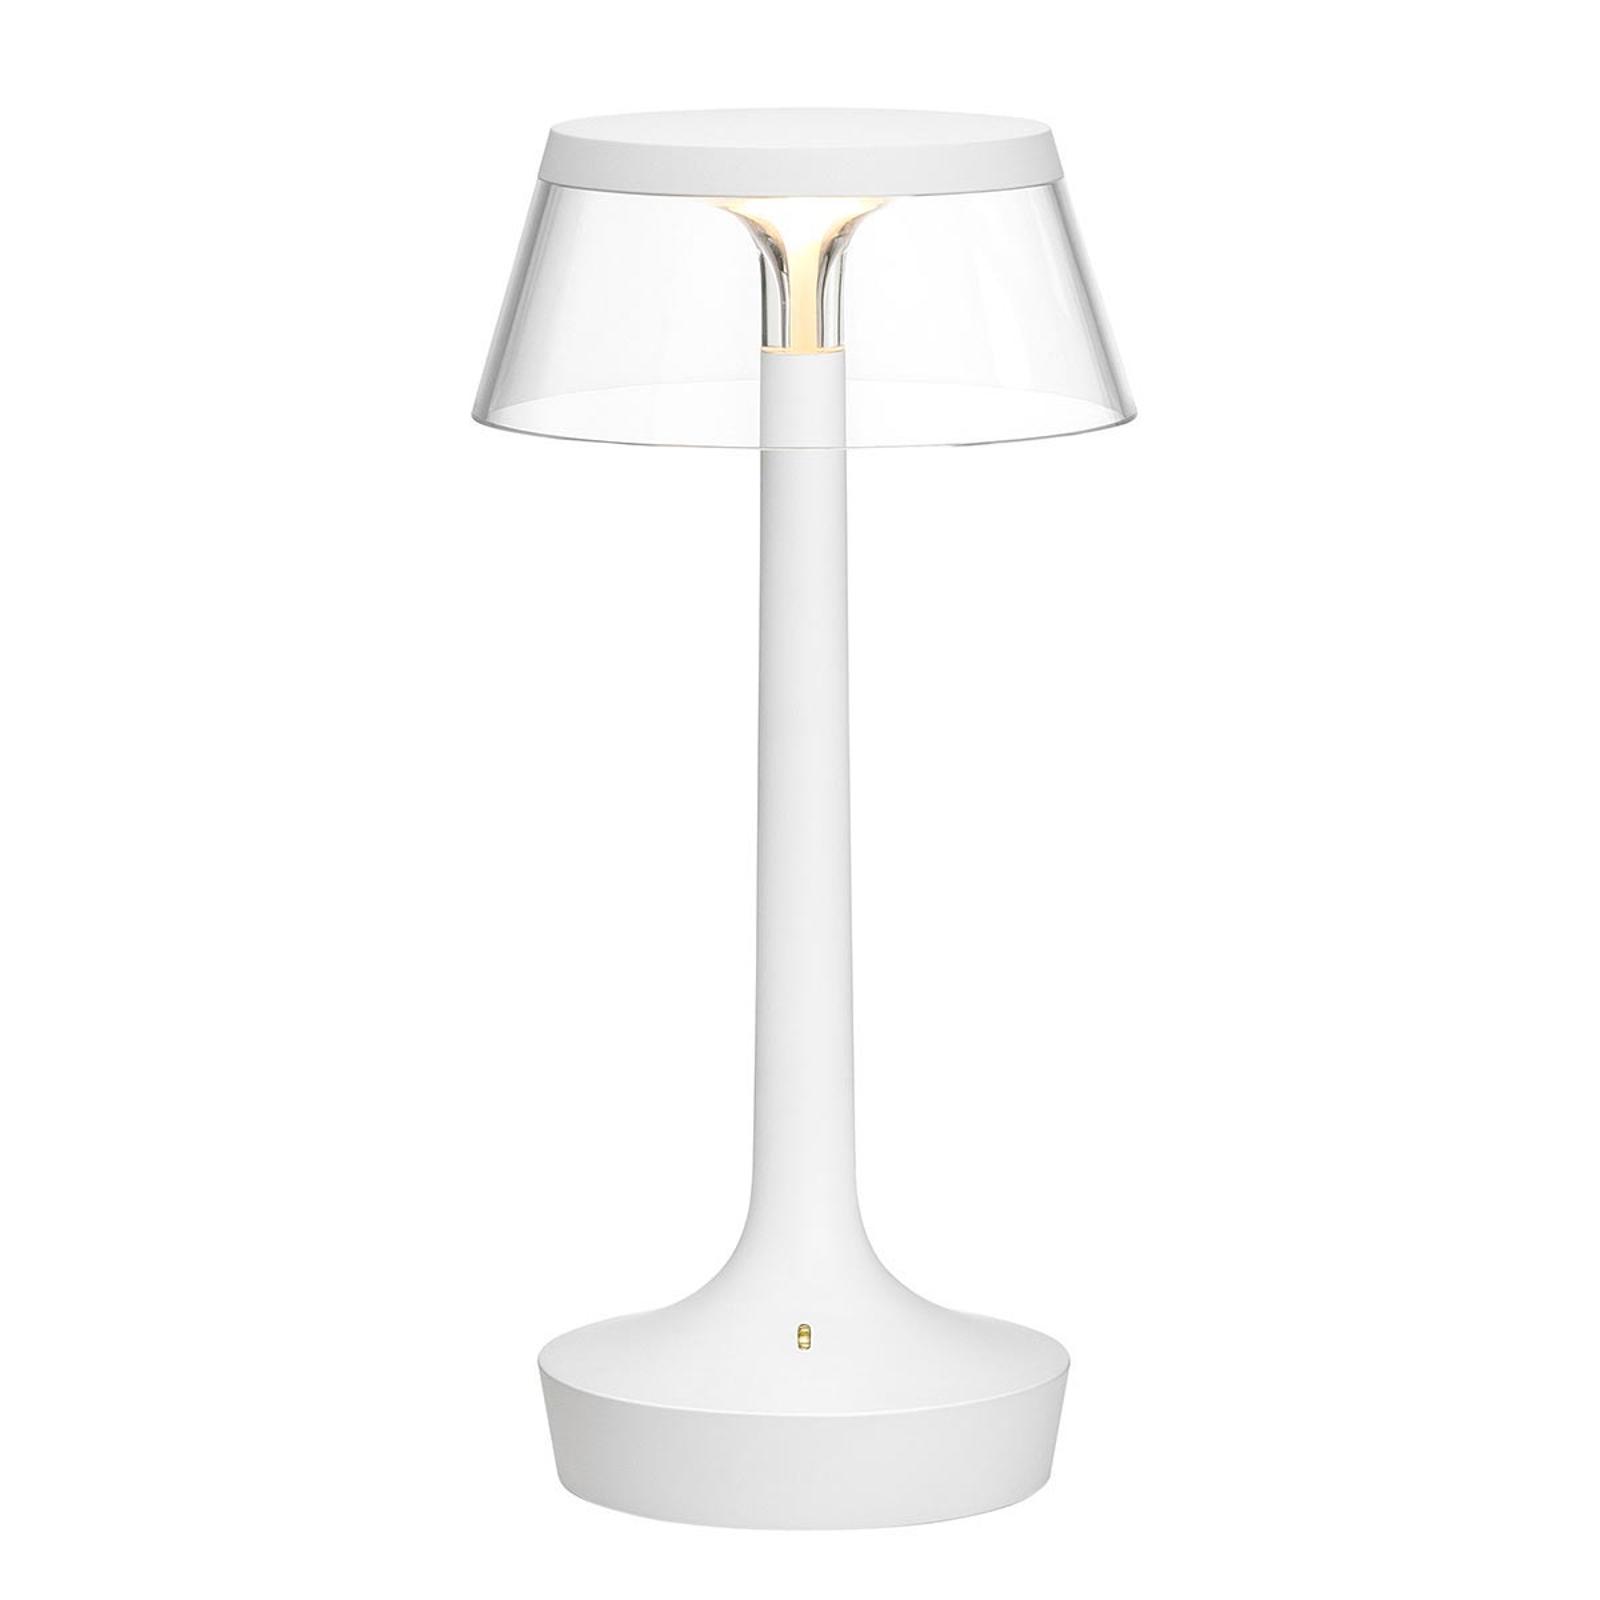 Oppladbar LED bordlampe Bon Jour unplugged